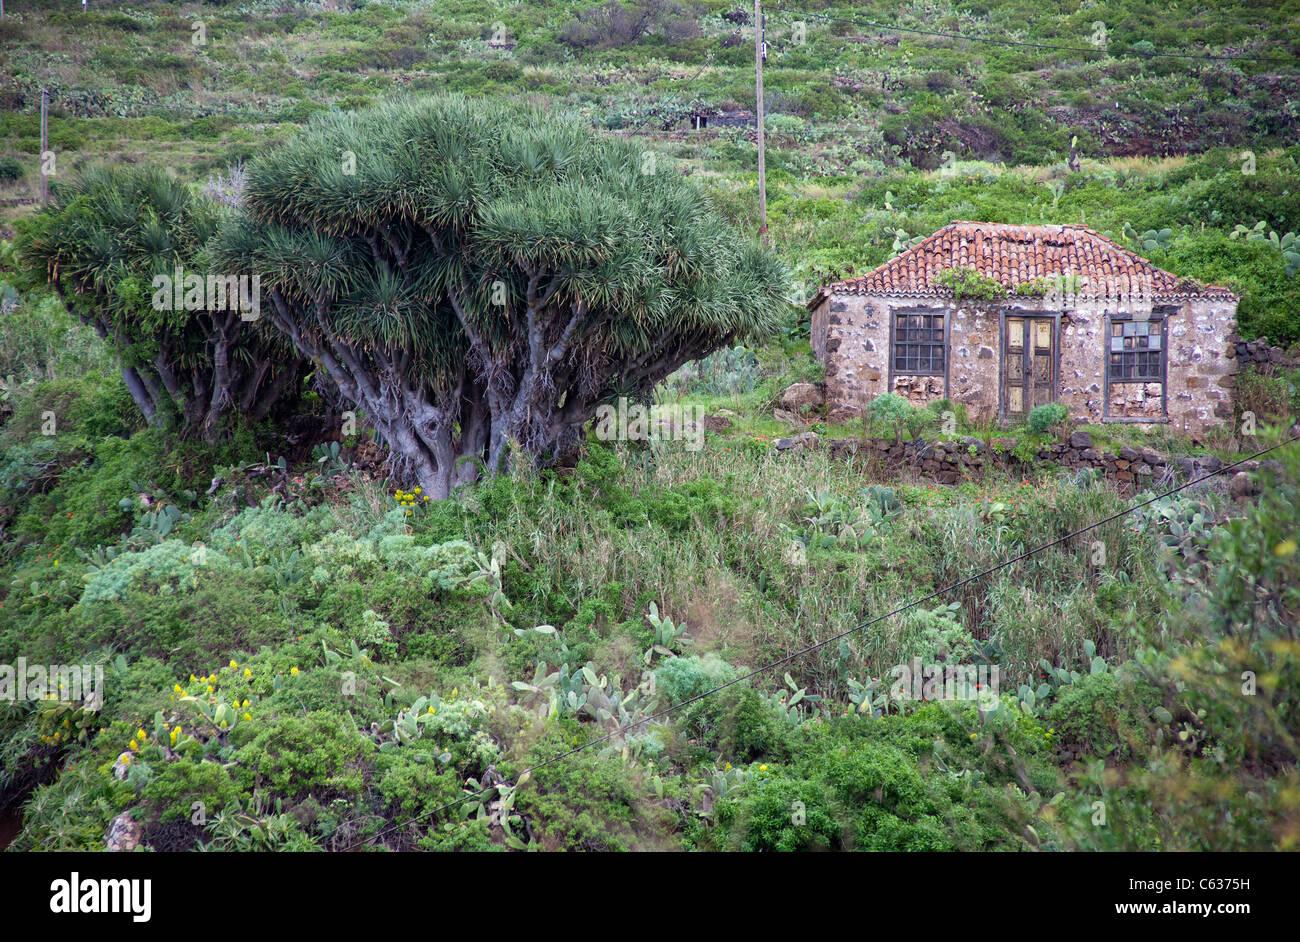 Alte farmerhouse und Drachenbaum (Dracaena Draco), Santo Domingo de Garafia, La Palma, Kanarische Inseln, Spanien, Stockbild